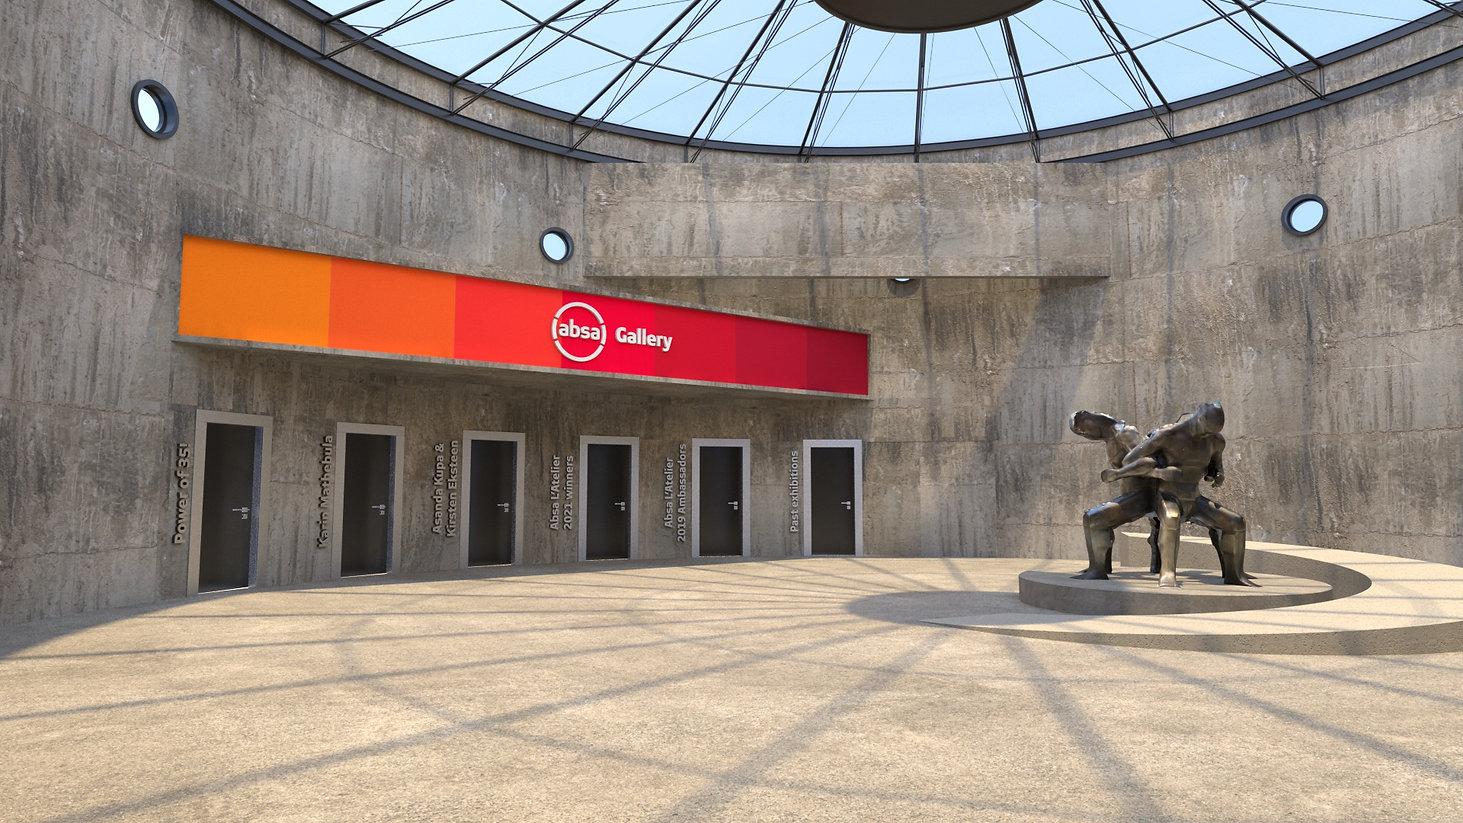 03-Absa Gallery Lobby (4).jpg